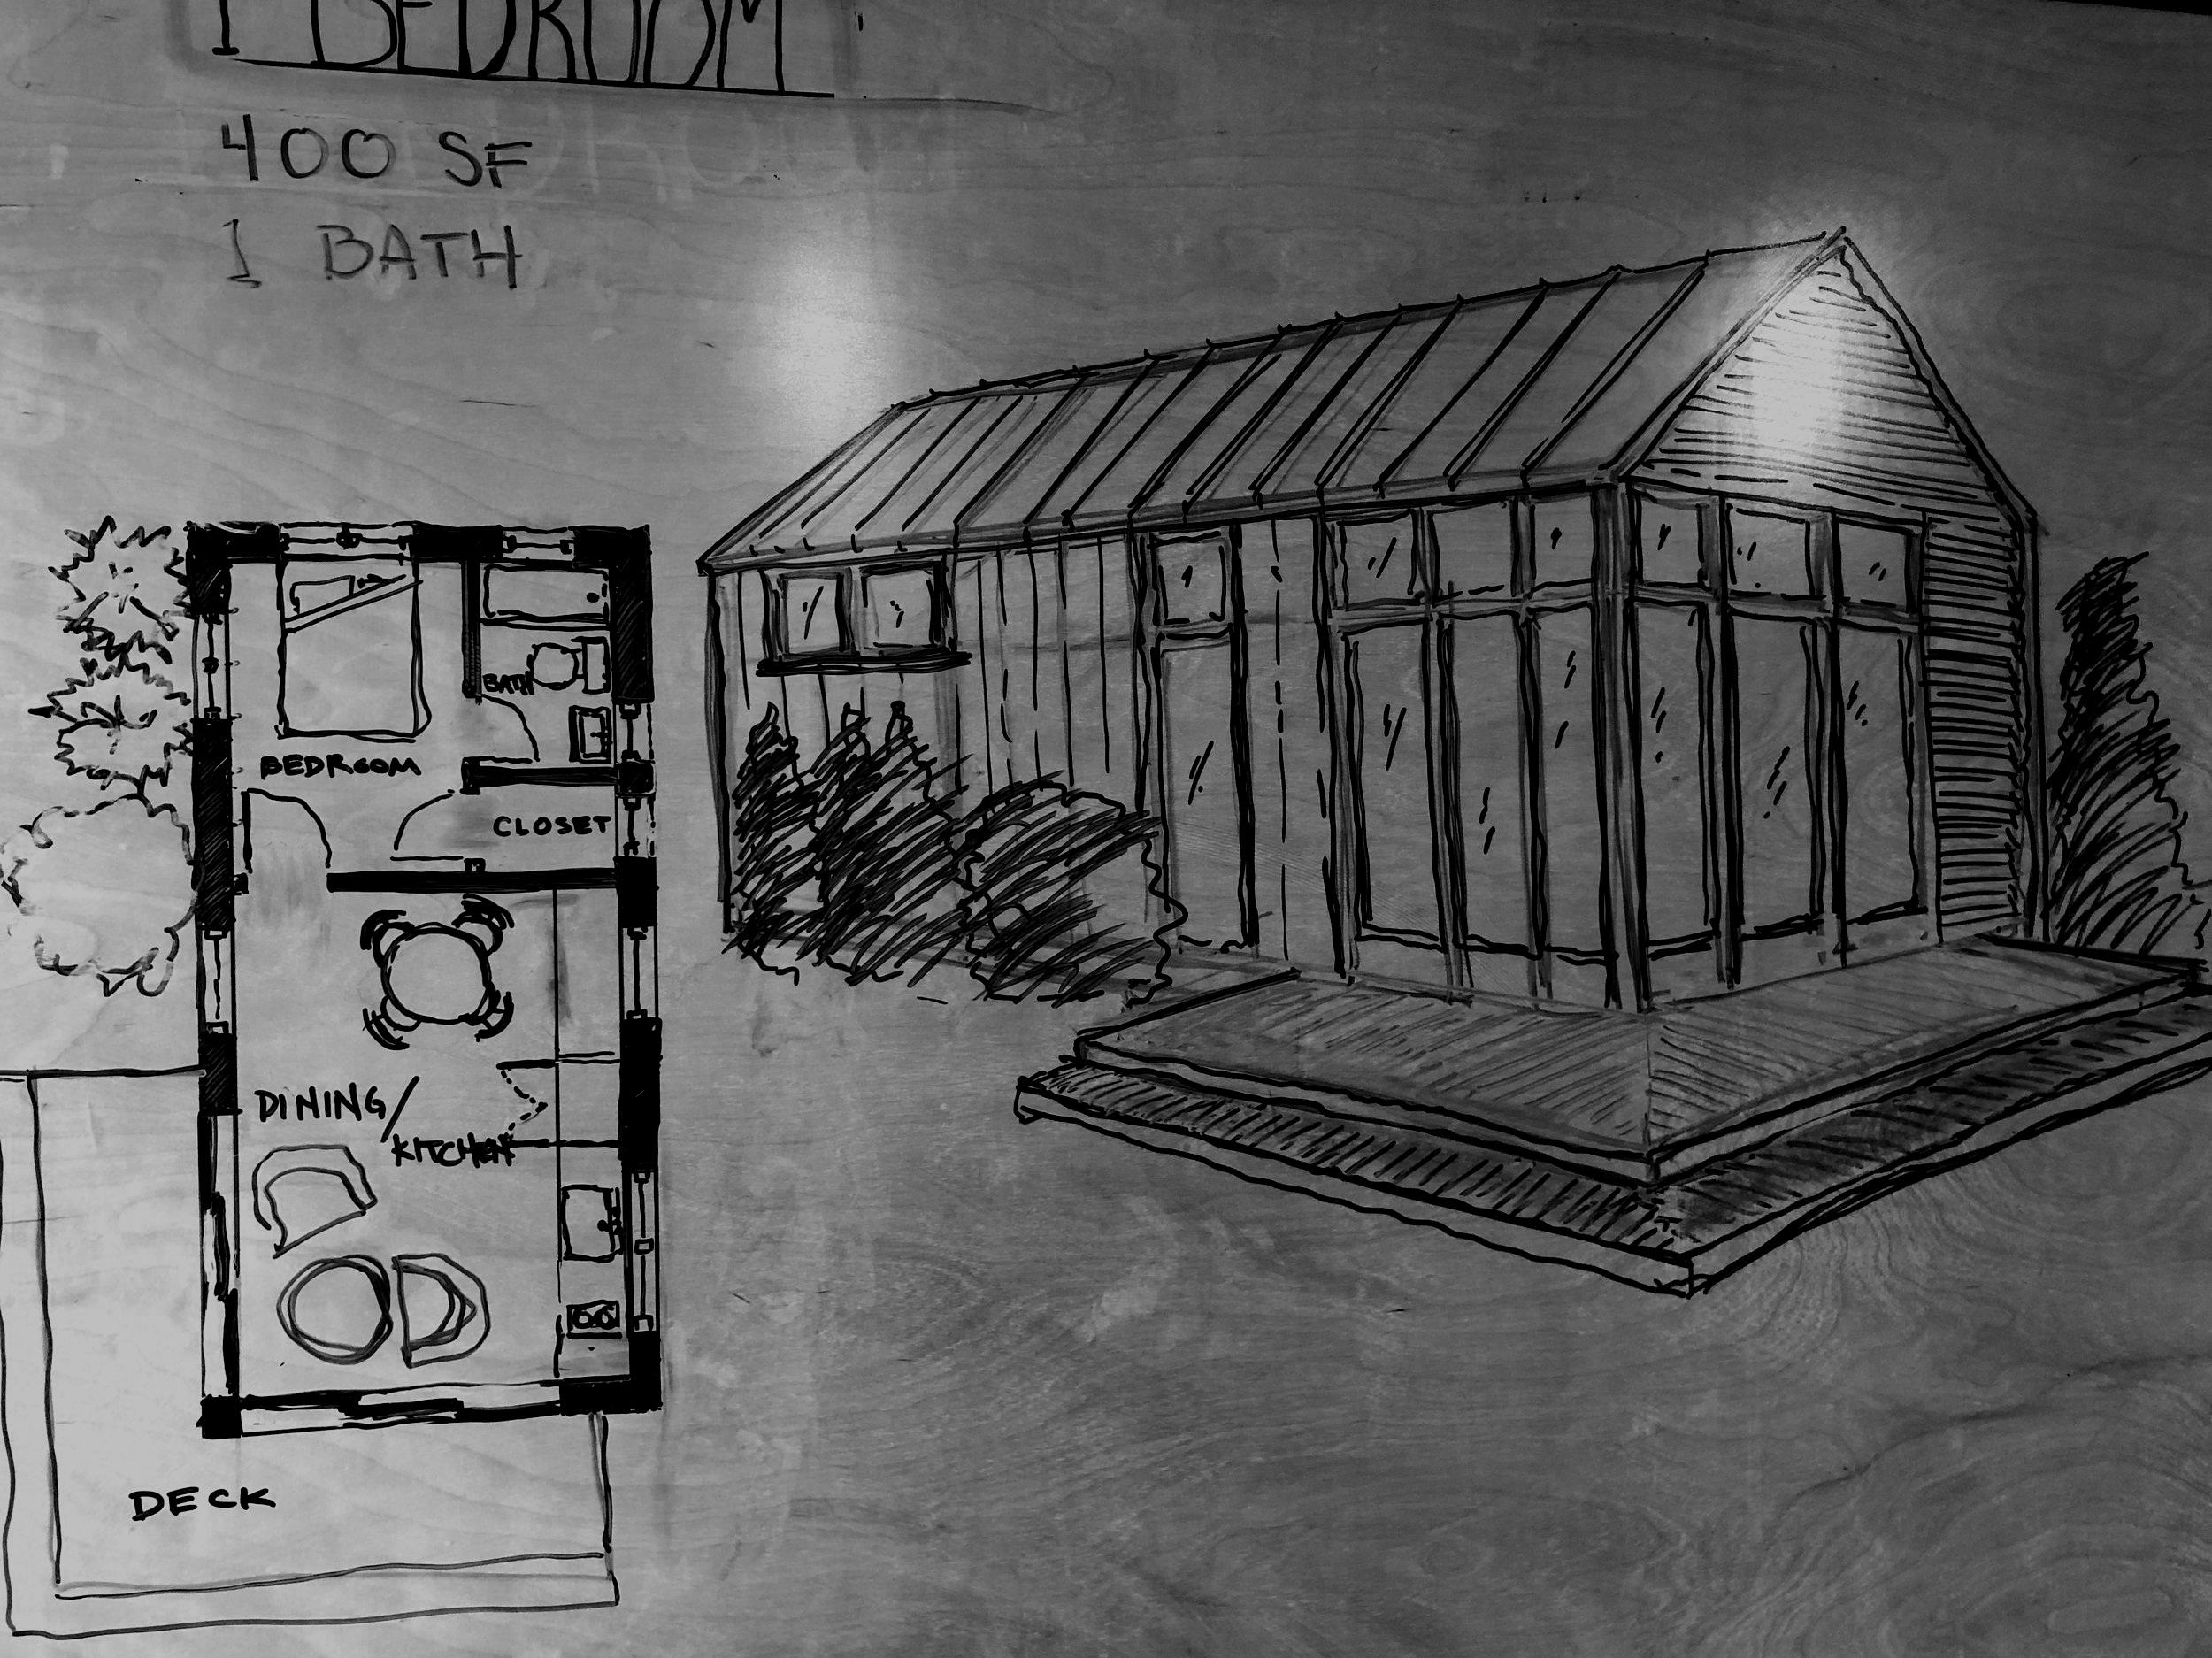 PASSIVE DADU 1 - 600 sf passive backyard cottage